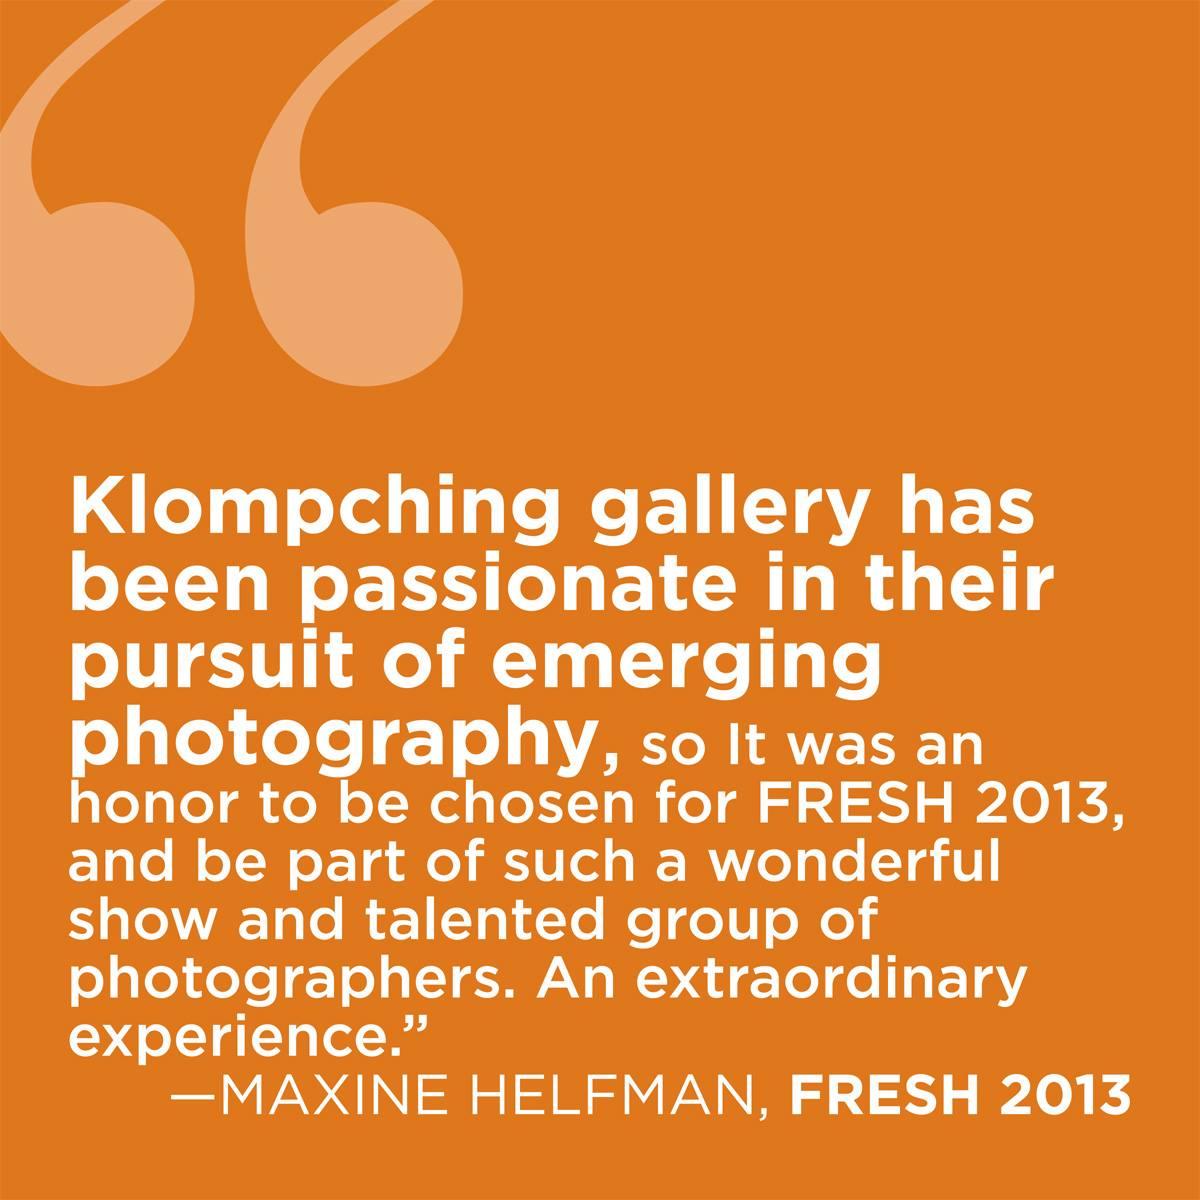 fresh2013-klompching-gallery-maxinehelfman.jpg